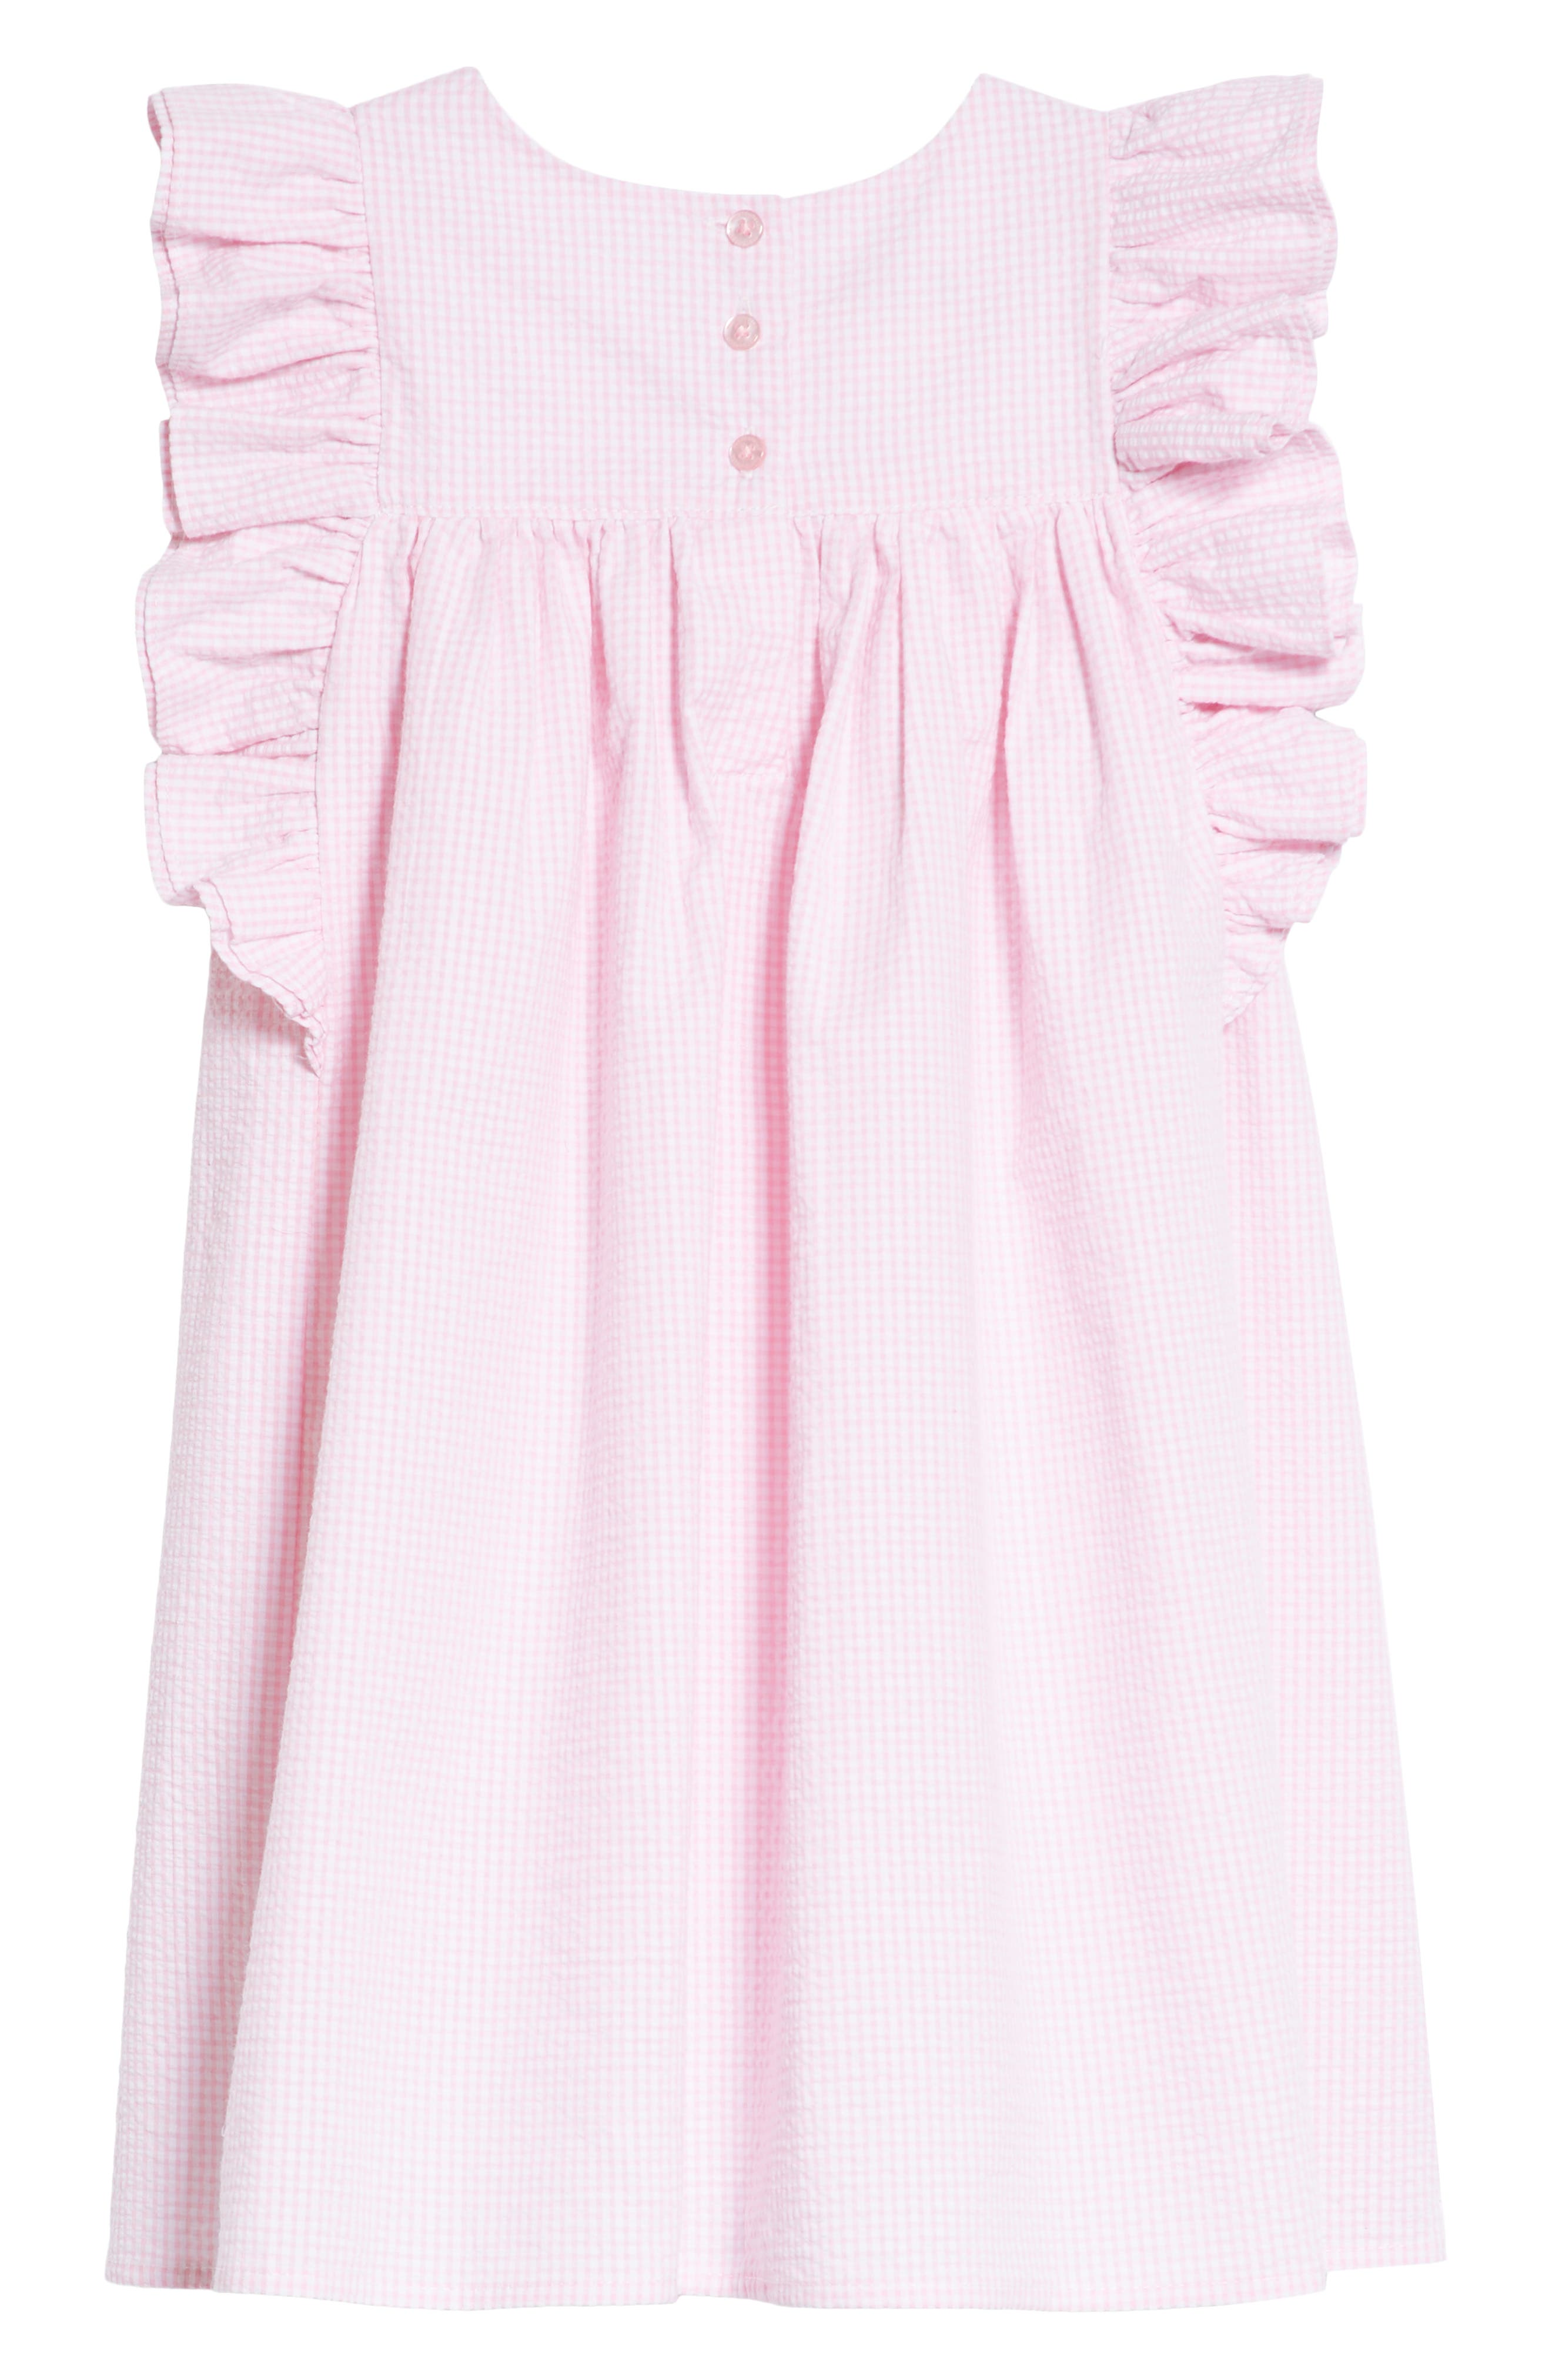 Seersucker Ruffle Sleeve Dress,                             Alternate thumbnail 2, color,